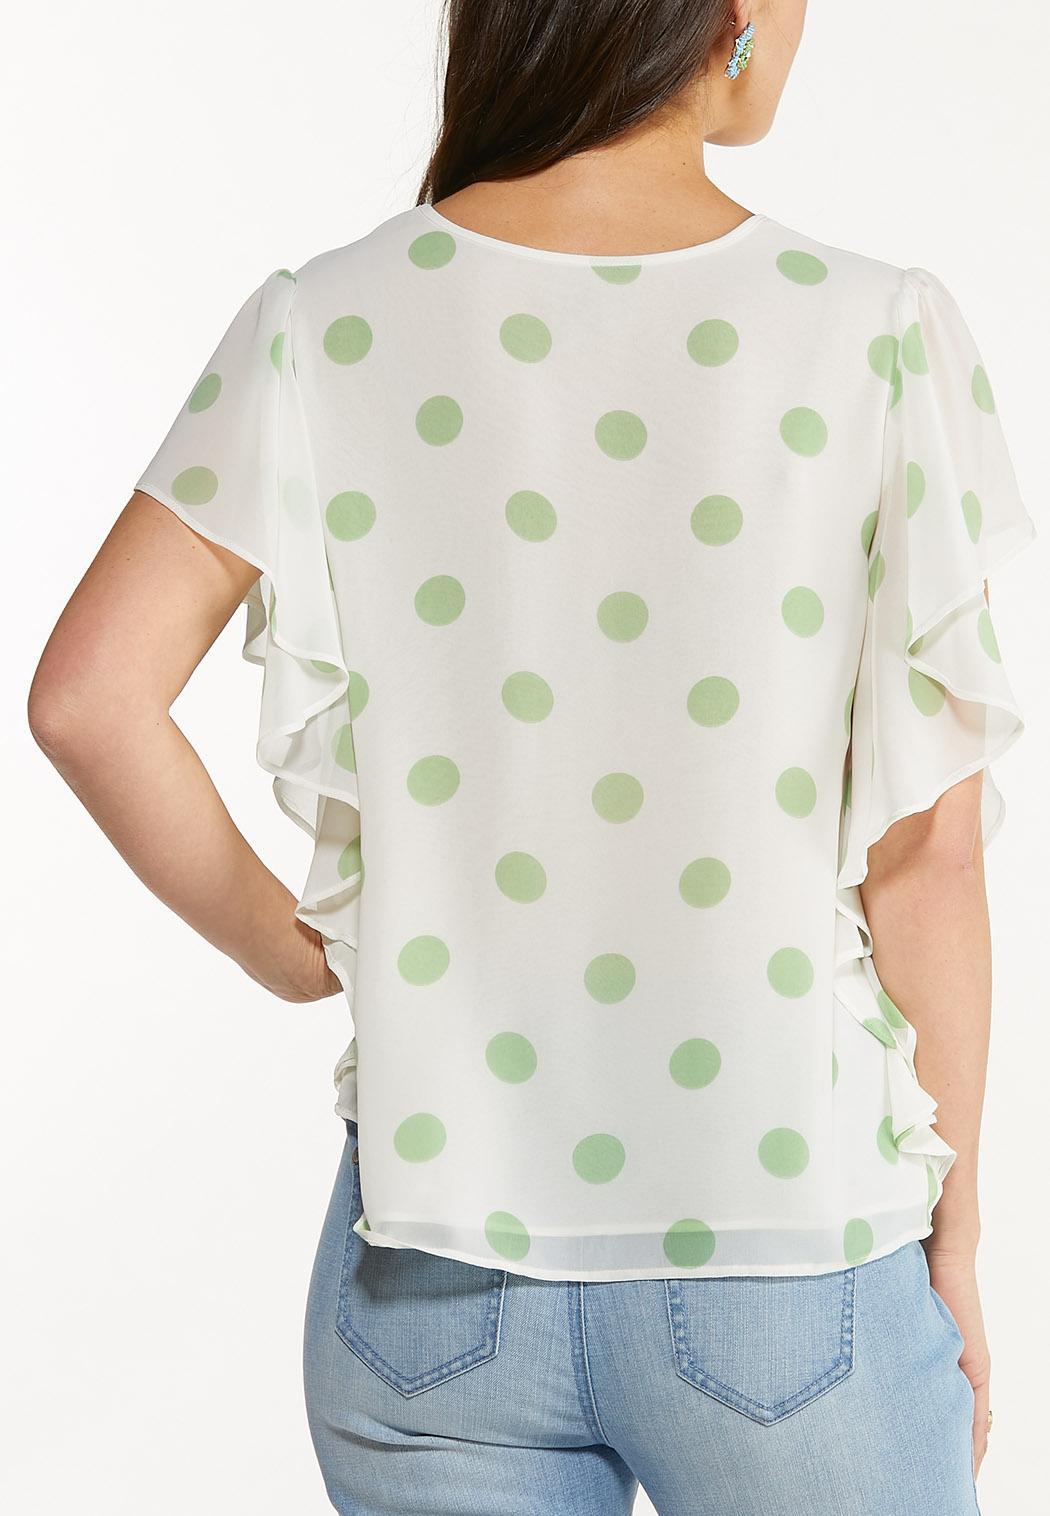 Ruffled Polka Dot Top (Item #44535819)